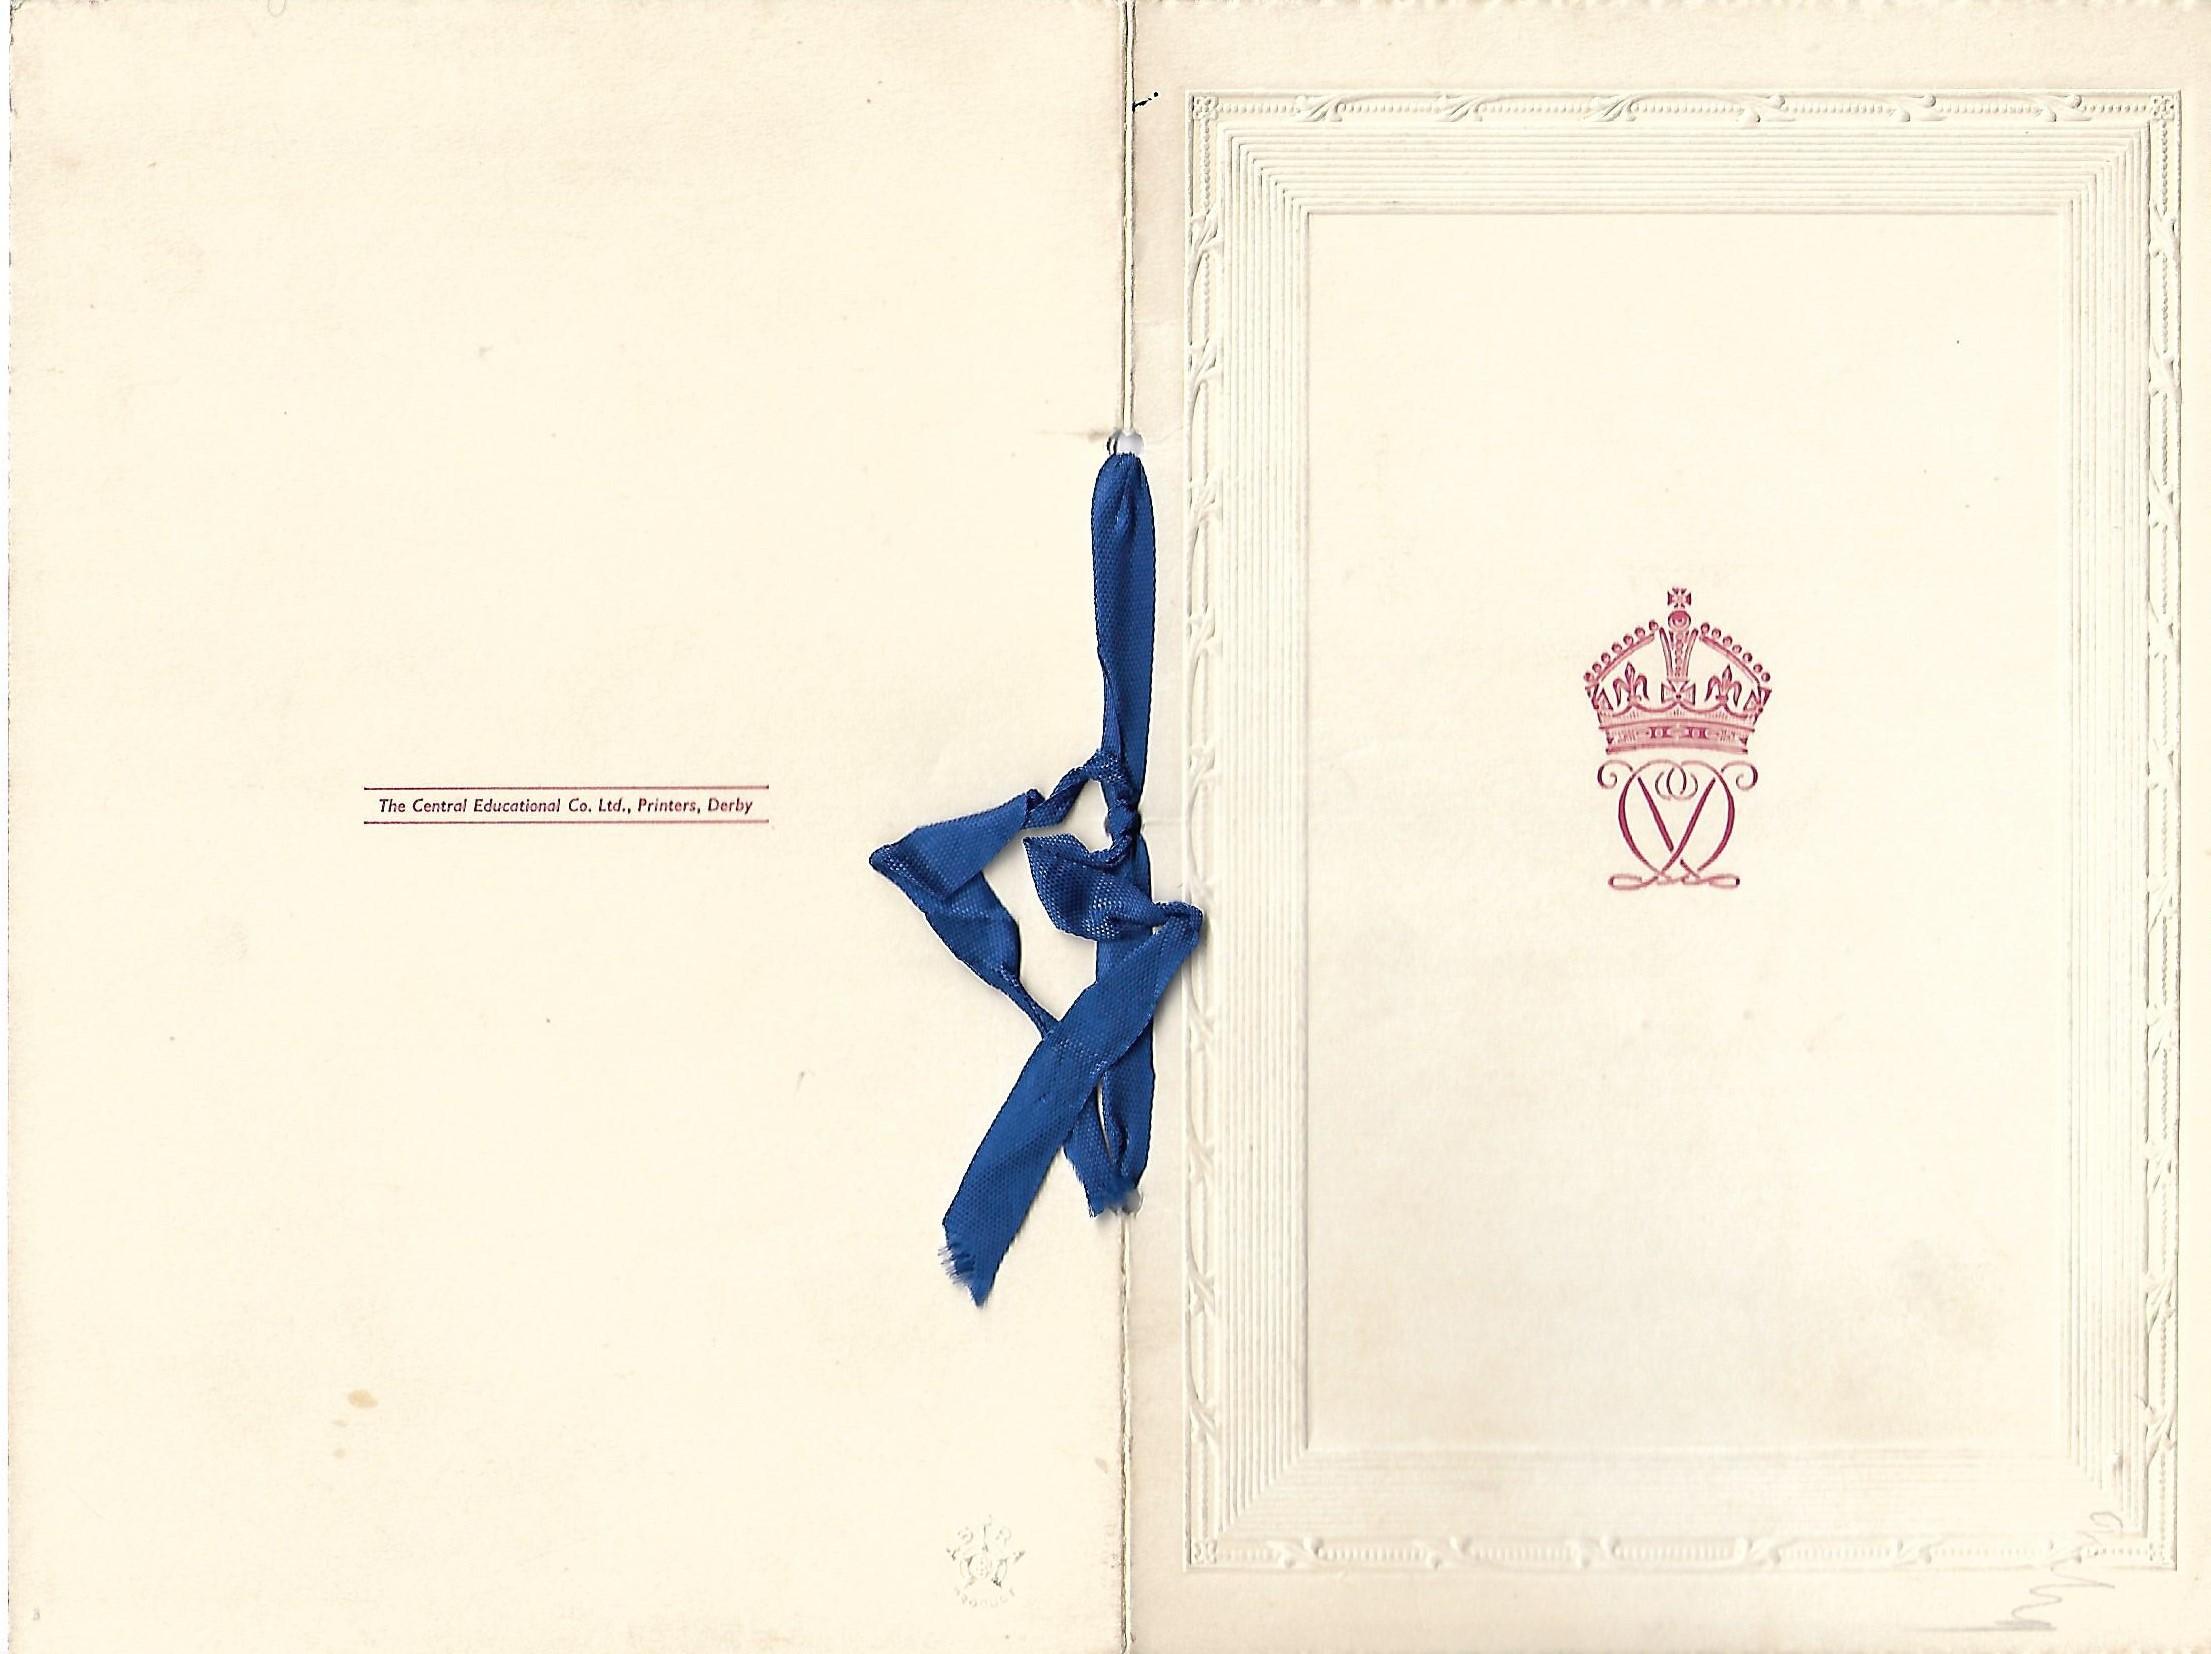 royal-crown-derby-bicentenary-dinner-menu-1950-page-1